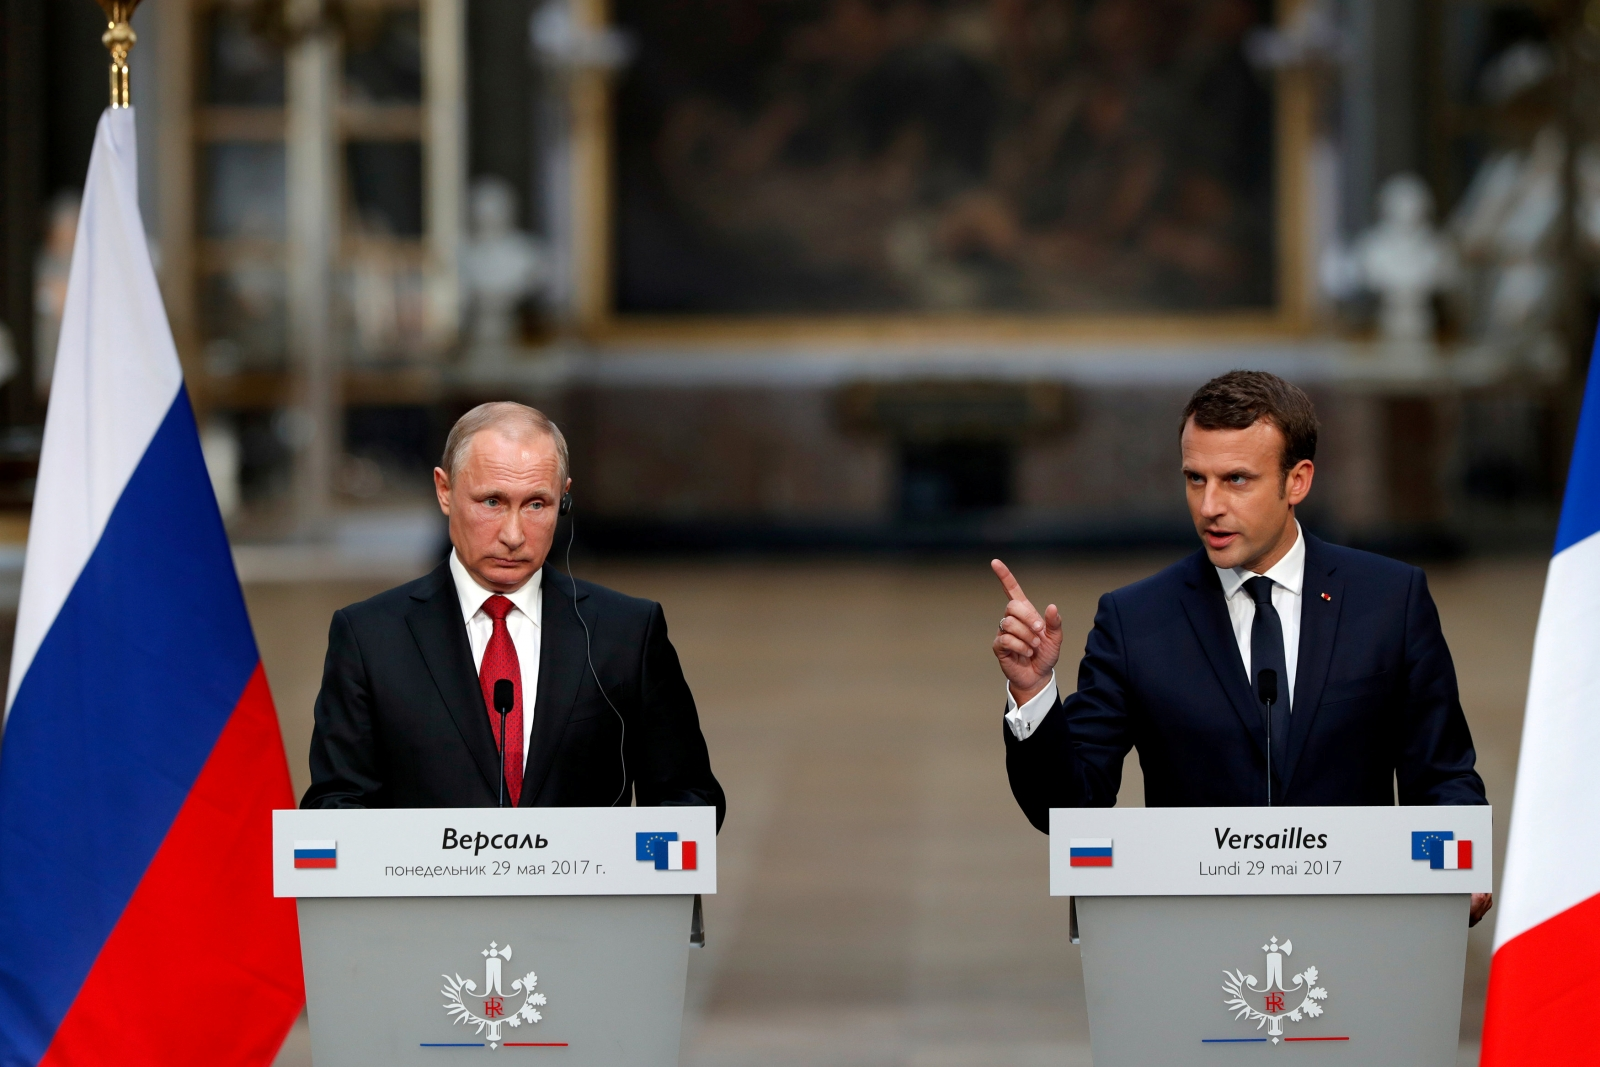 Putin meets with Macron